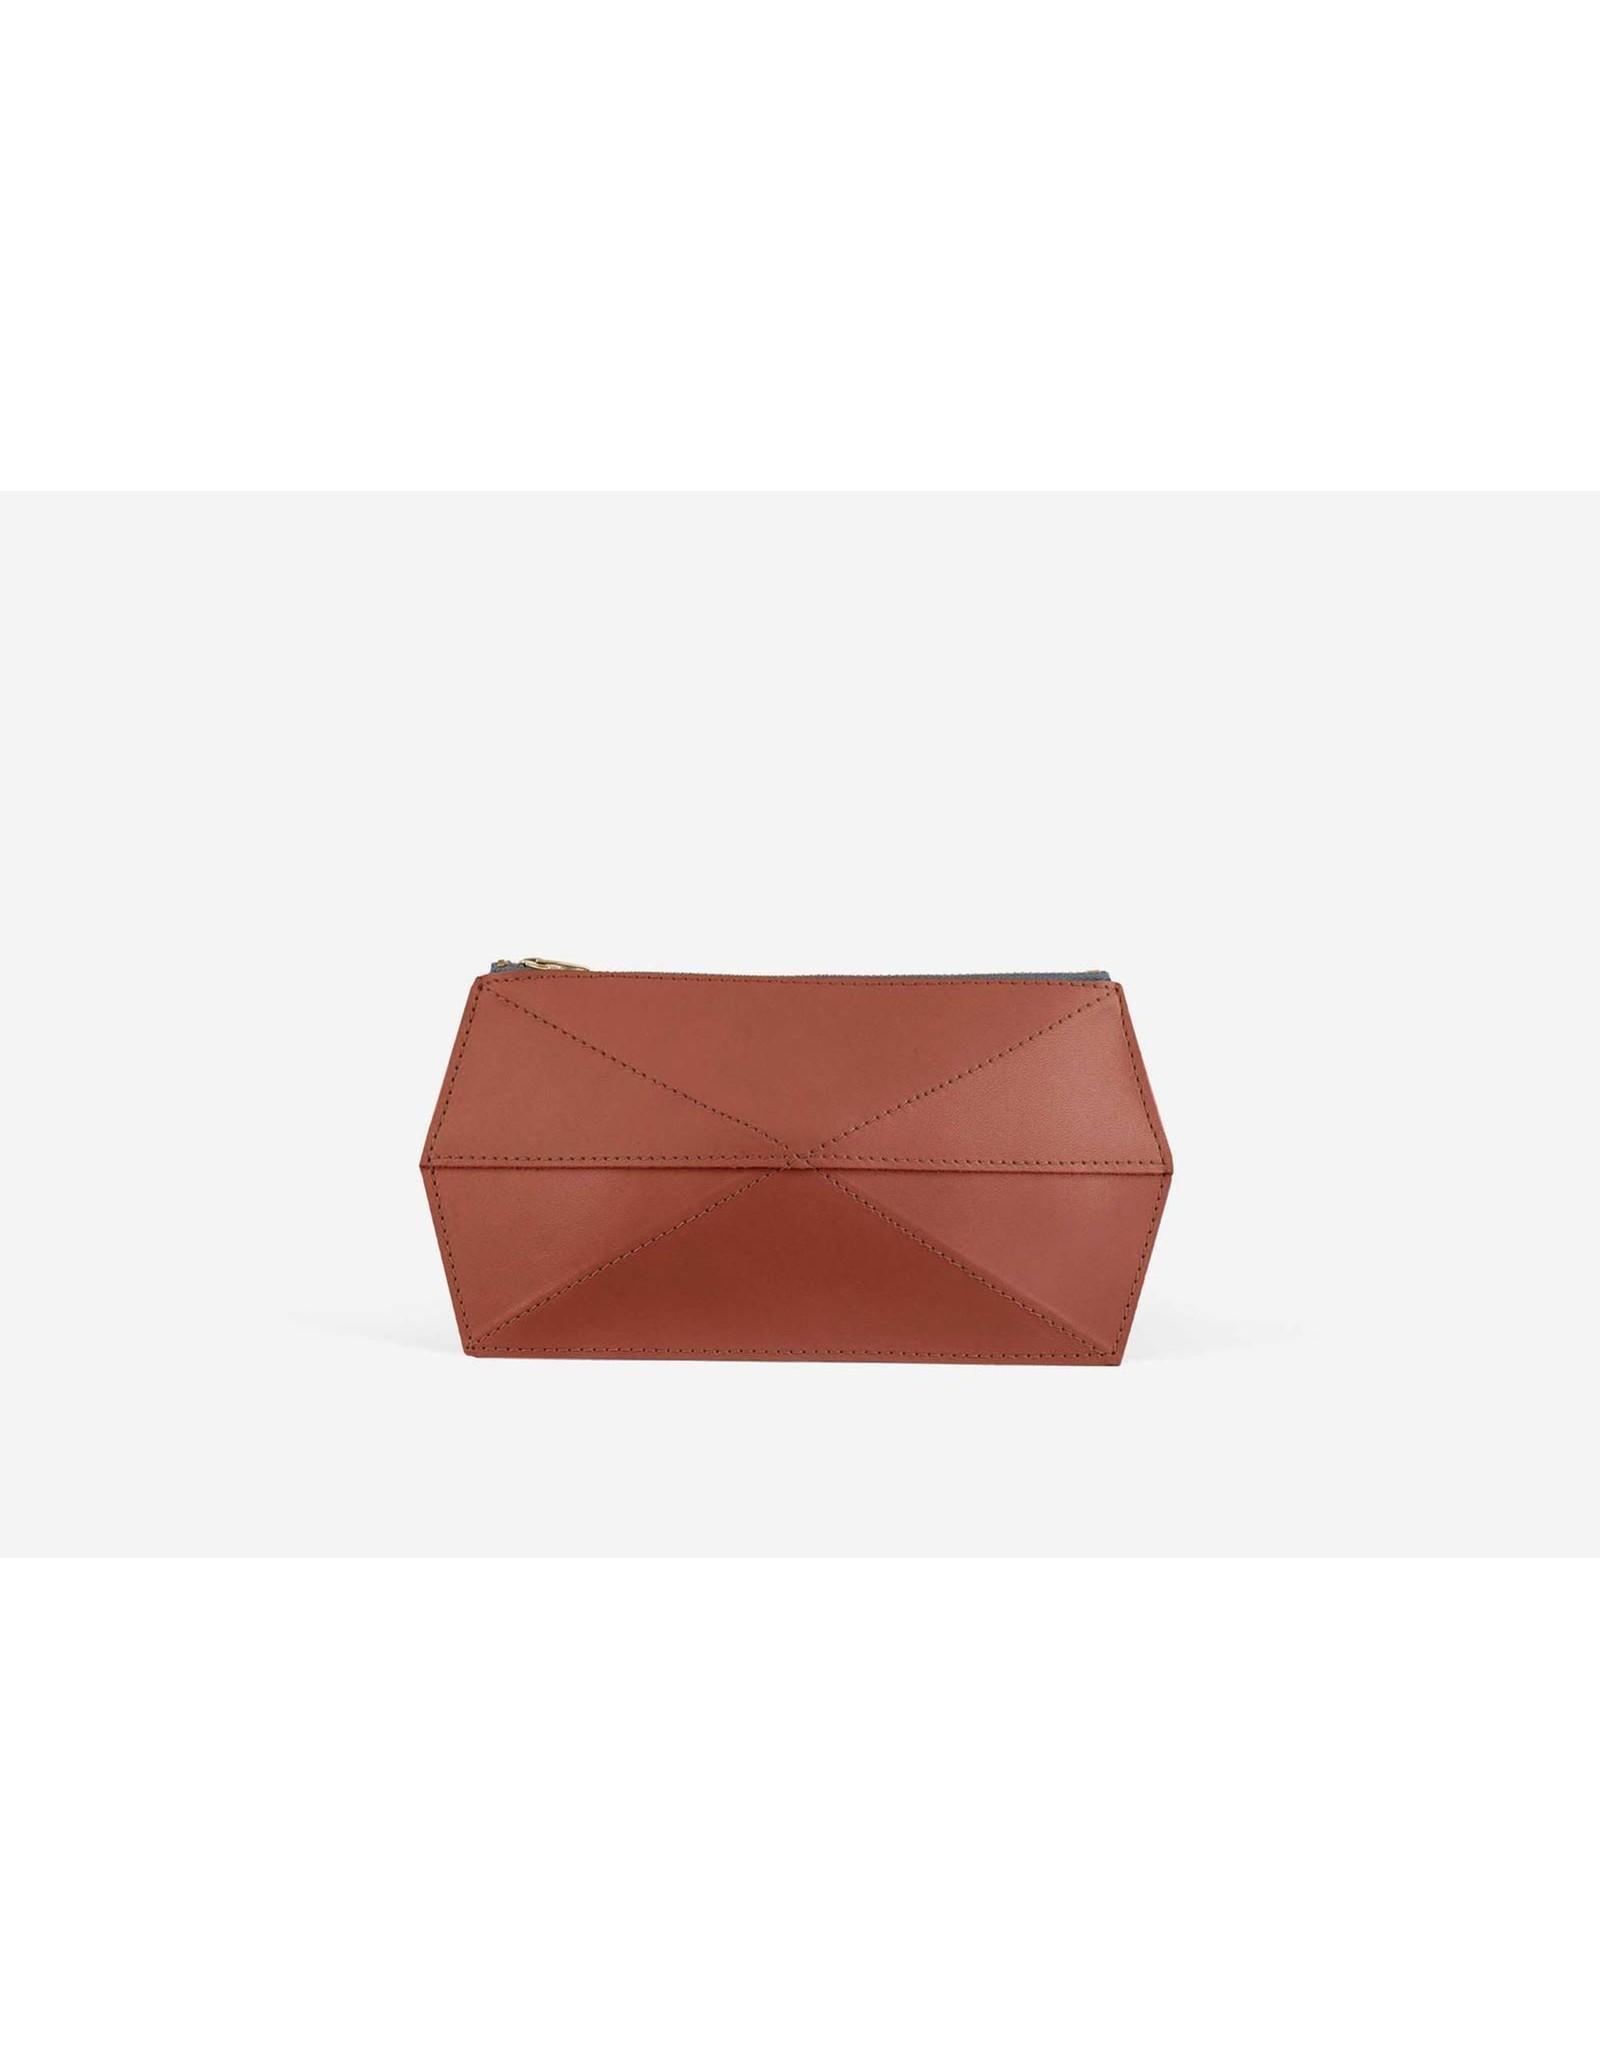 Zand-erover 3D case | Mini Fold | Terracotta